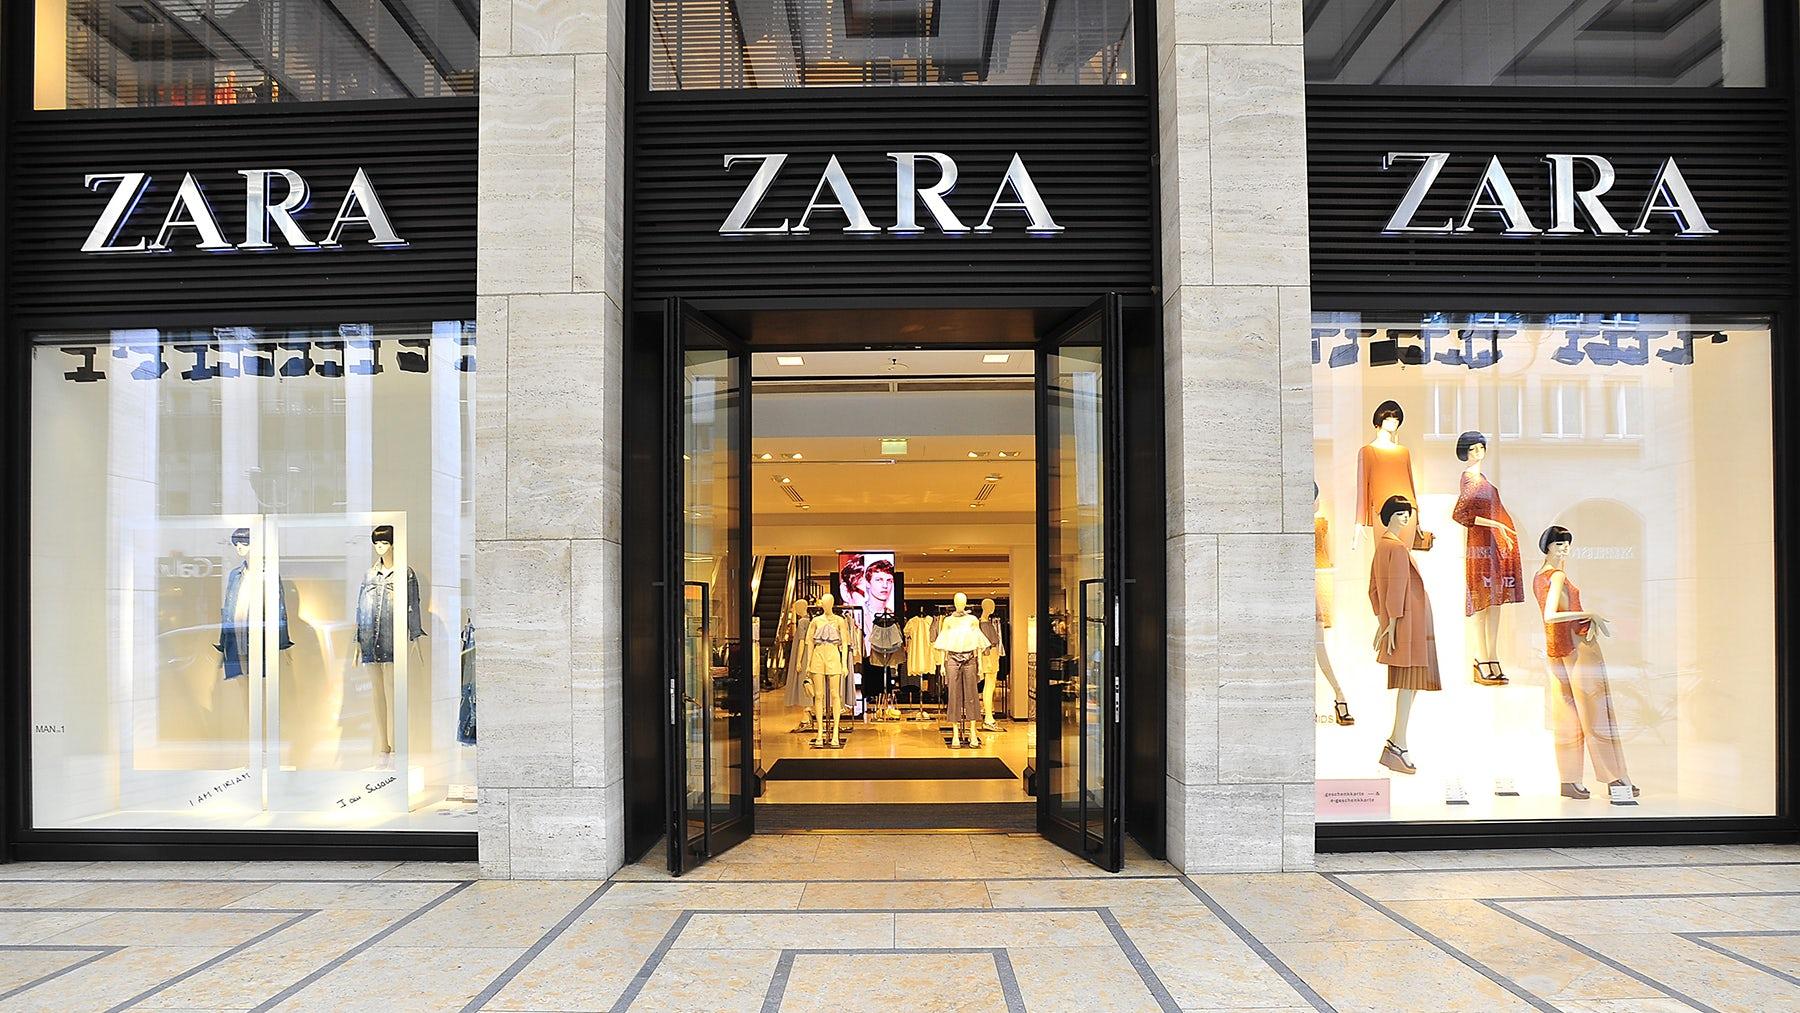 Social Goods | Unpaid Zara Workers Seek Help, Catholicism at the Costume Institute